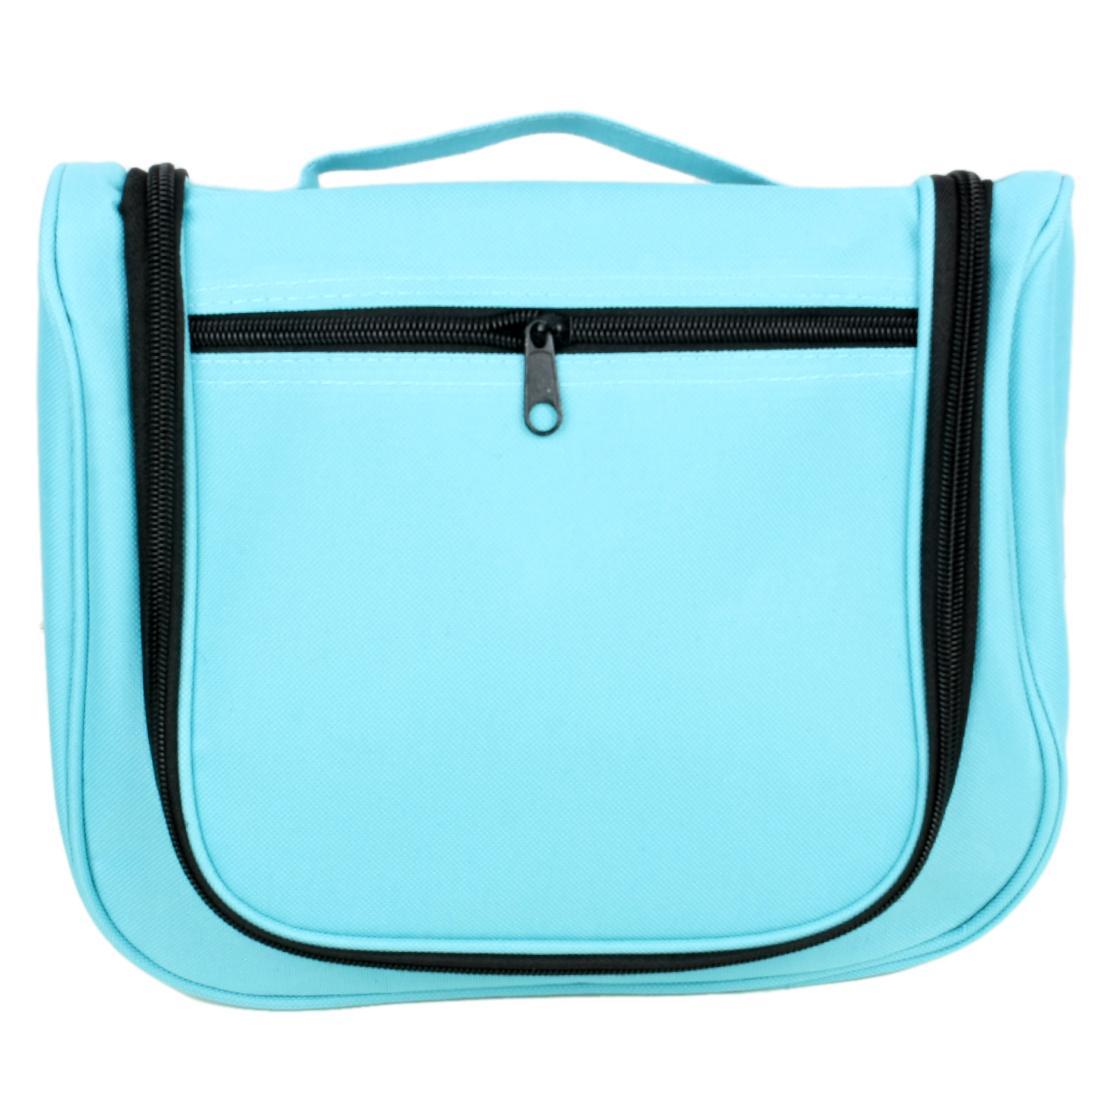 Outdoor Travel Nylon Makeup Carrying Storage Organizer Wash Bag Blue